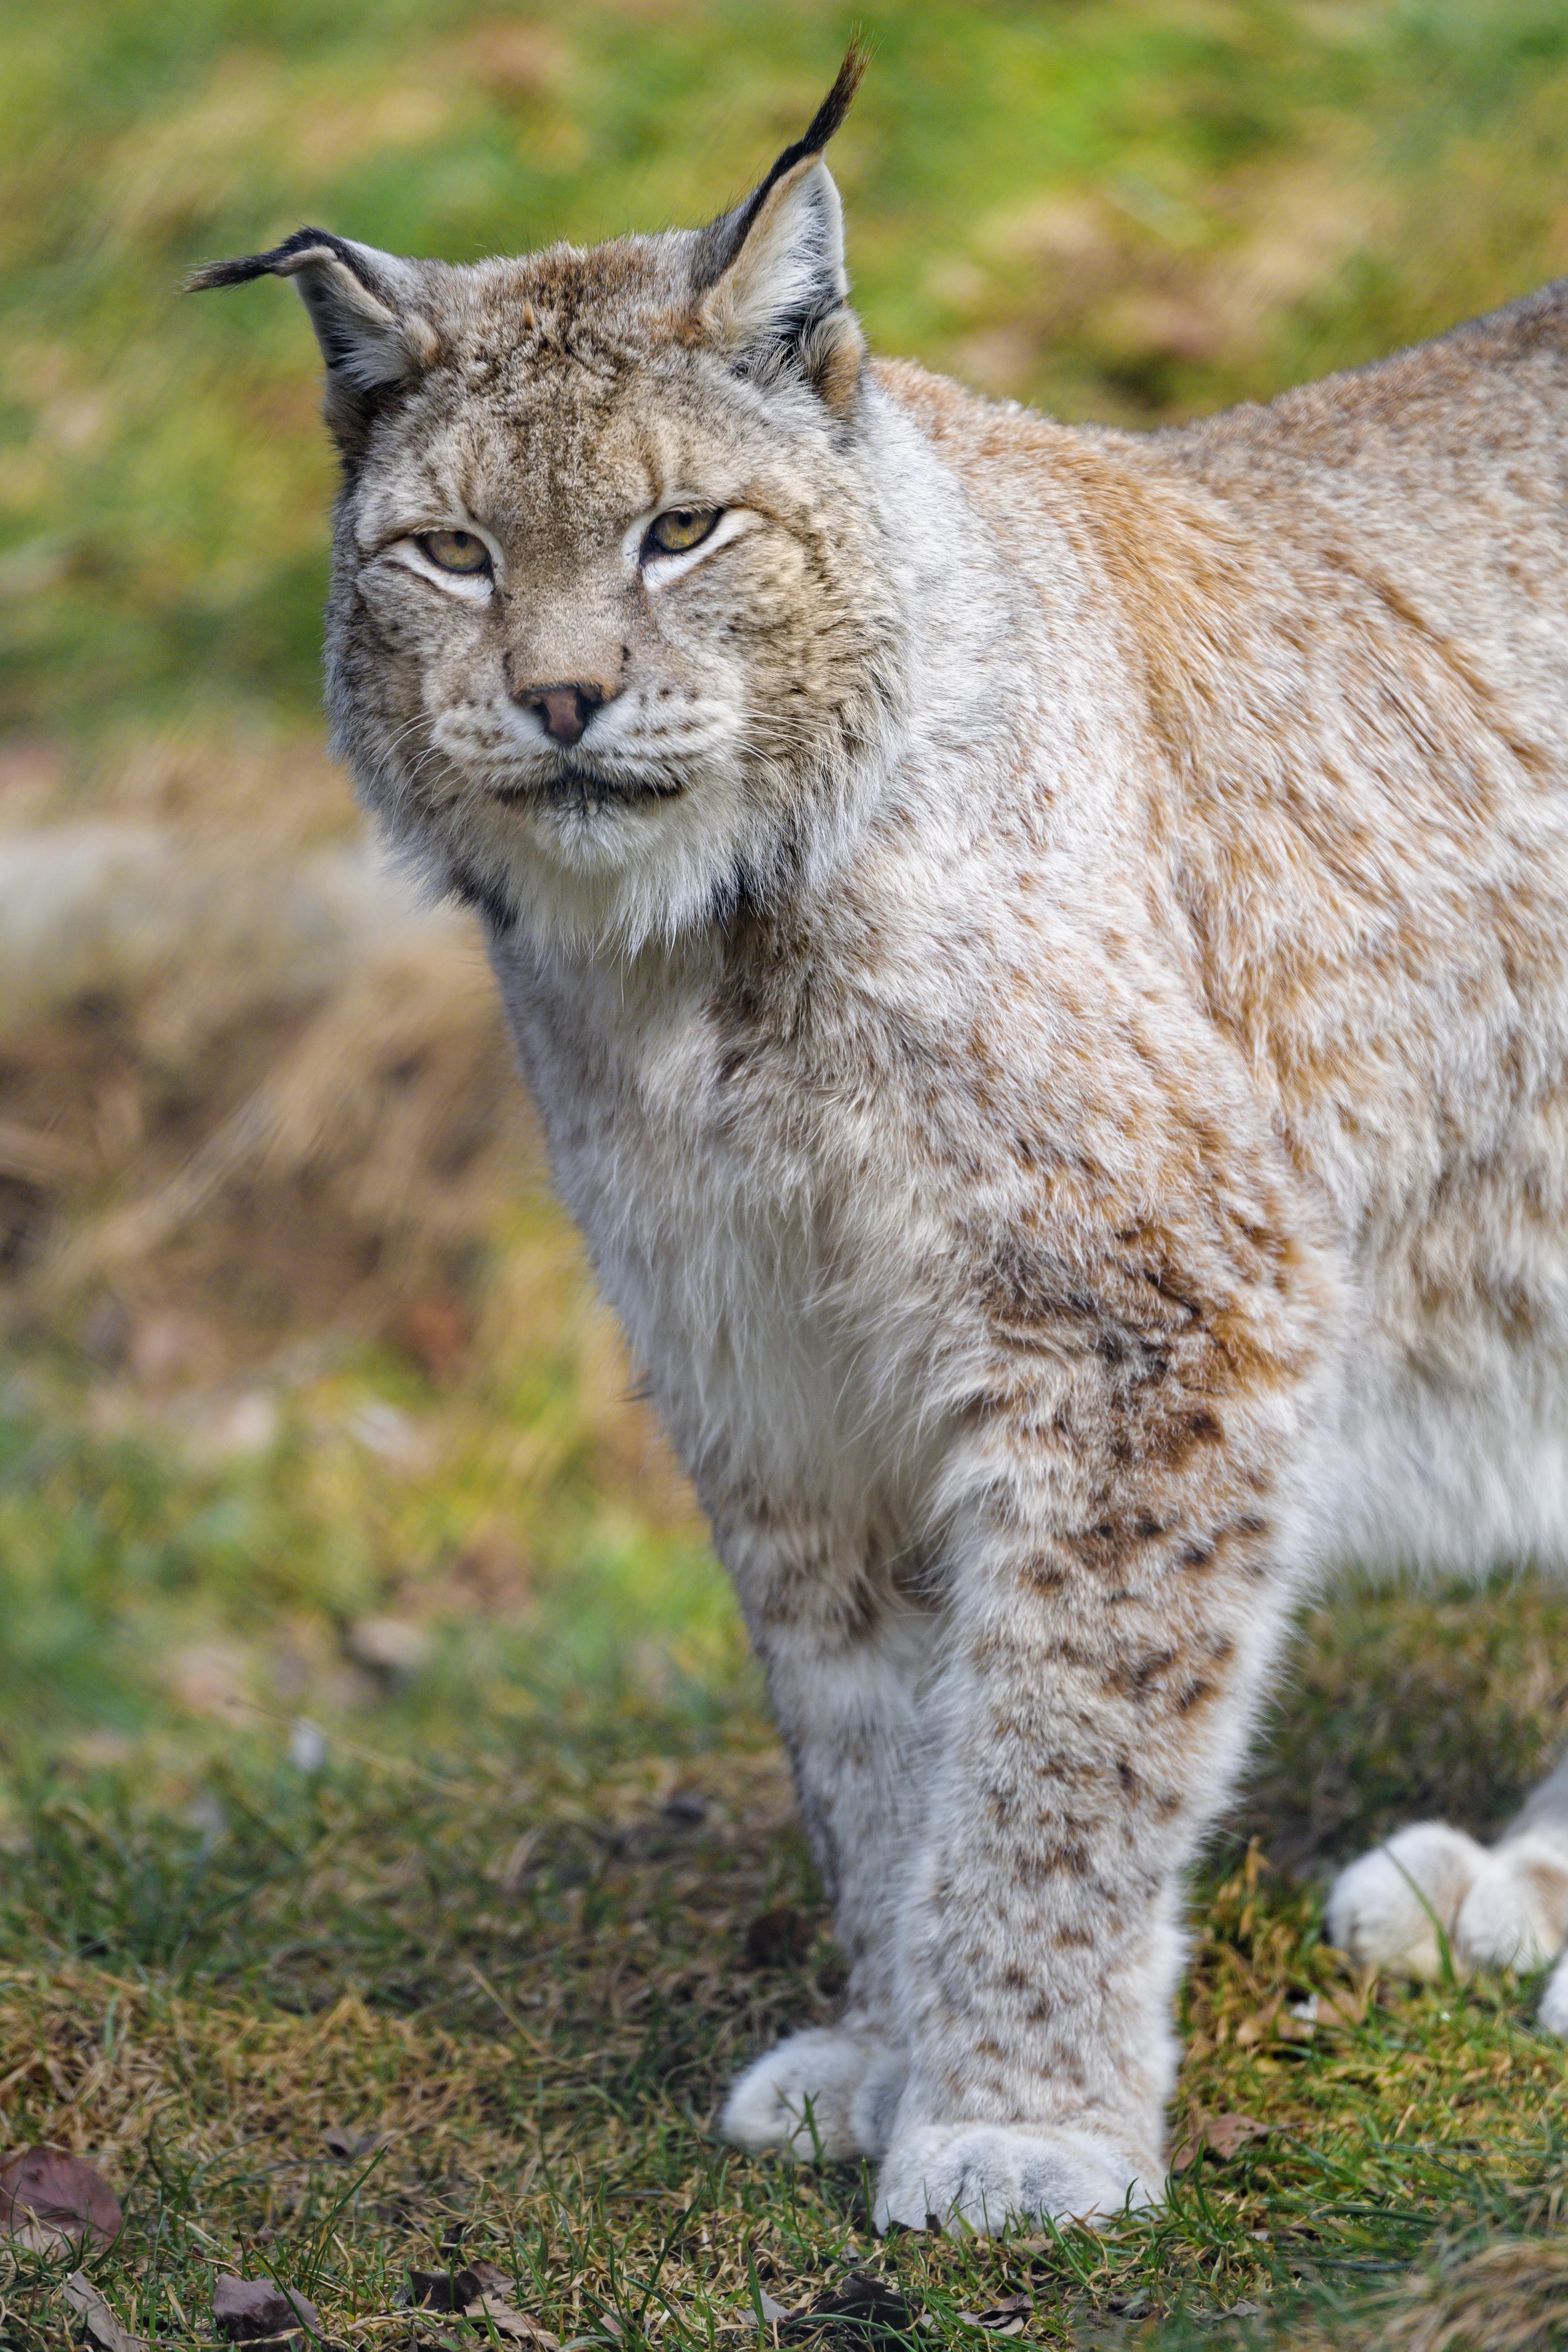 149168 download wallpaper Animals, Iris, Predator, Animal, Big Cat, Wildlife screensavers and pictures for free